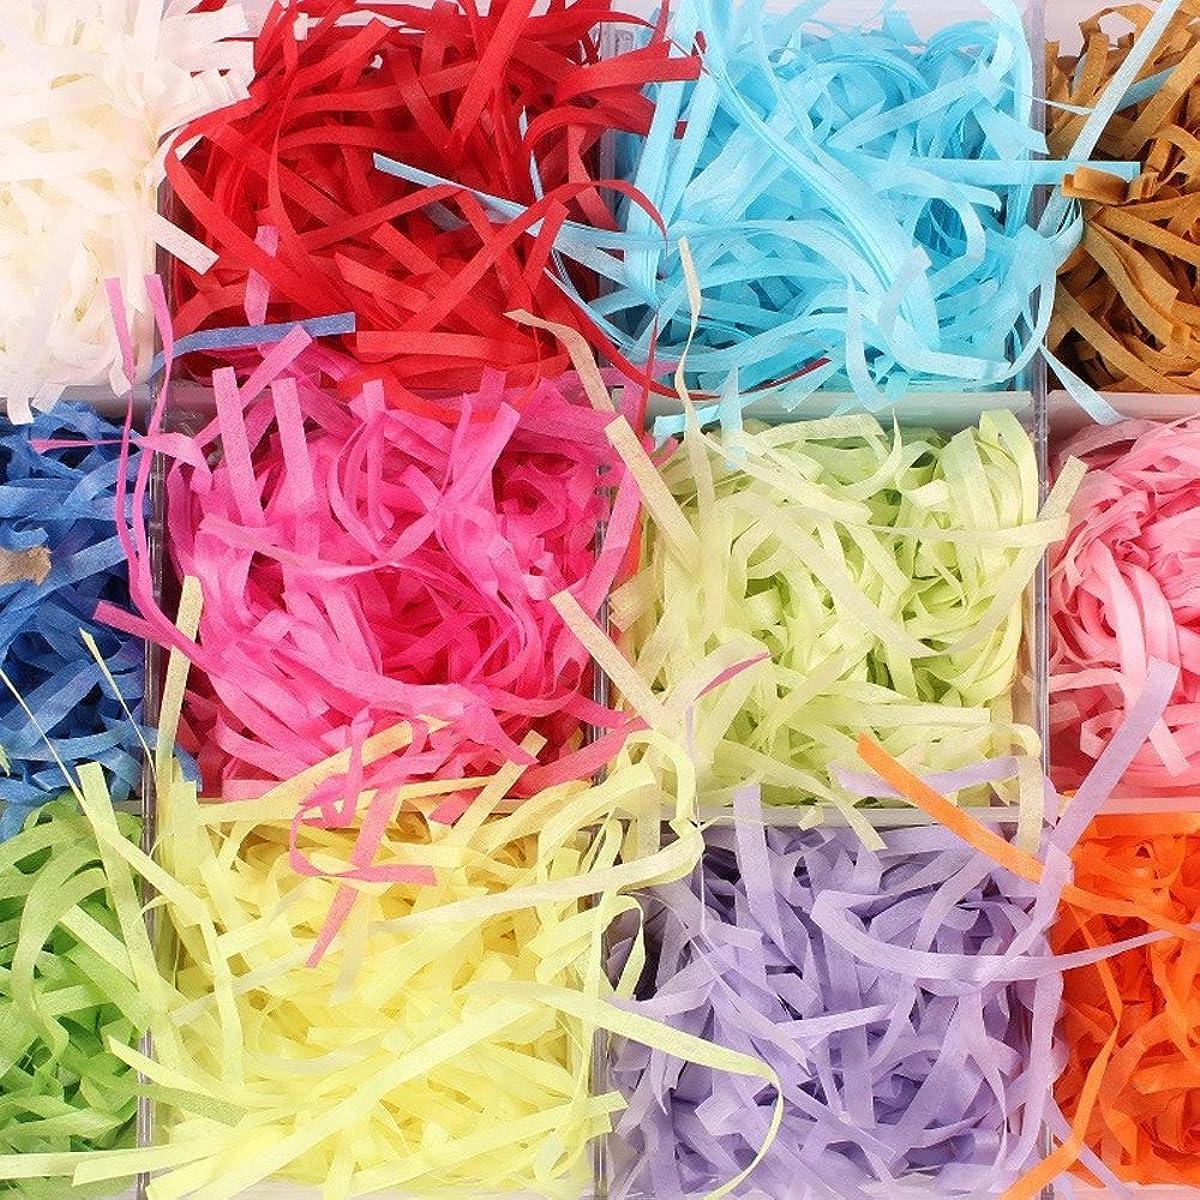 HUELE 200g Paper Shreds & Strands Shredded Crinkle Paper Raffia Paper Confetti DIY Dry Straw Gifts Box Filling Material (20g/Bag )